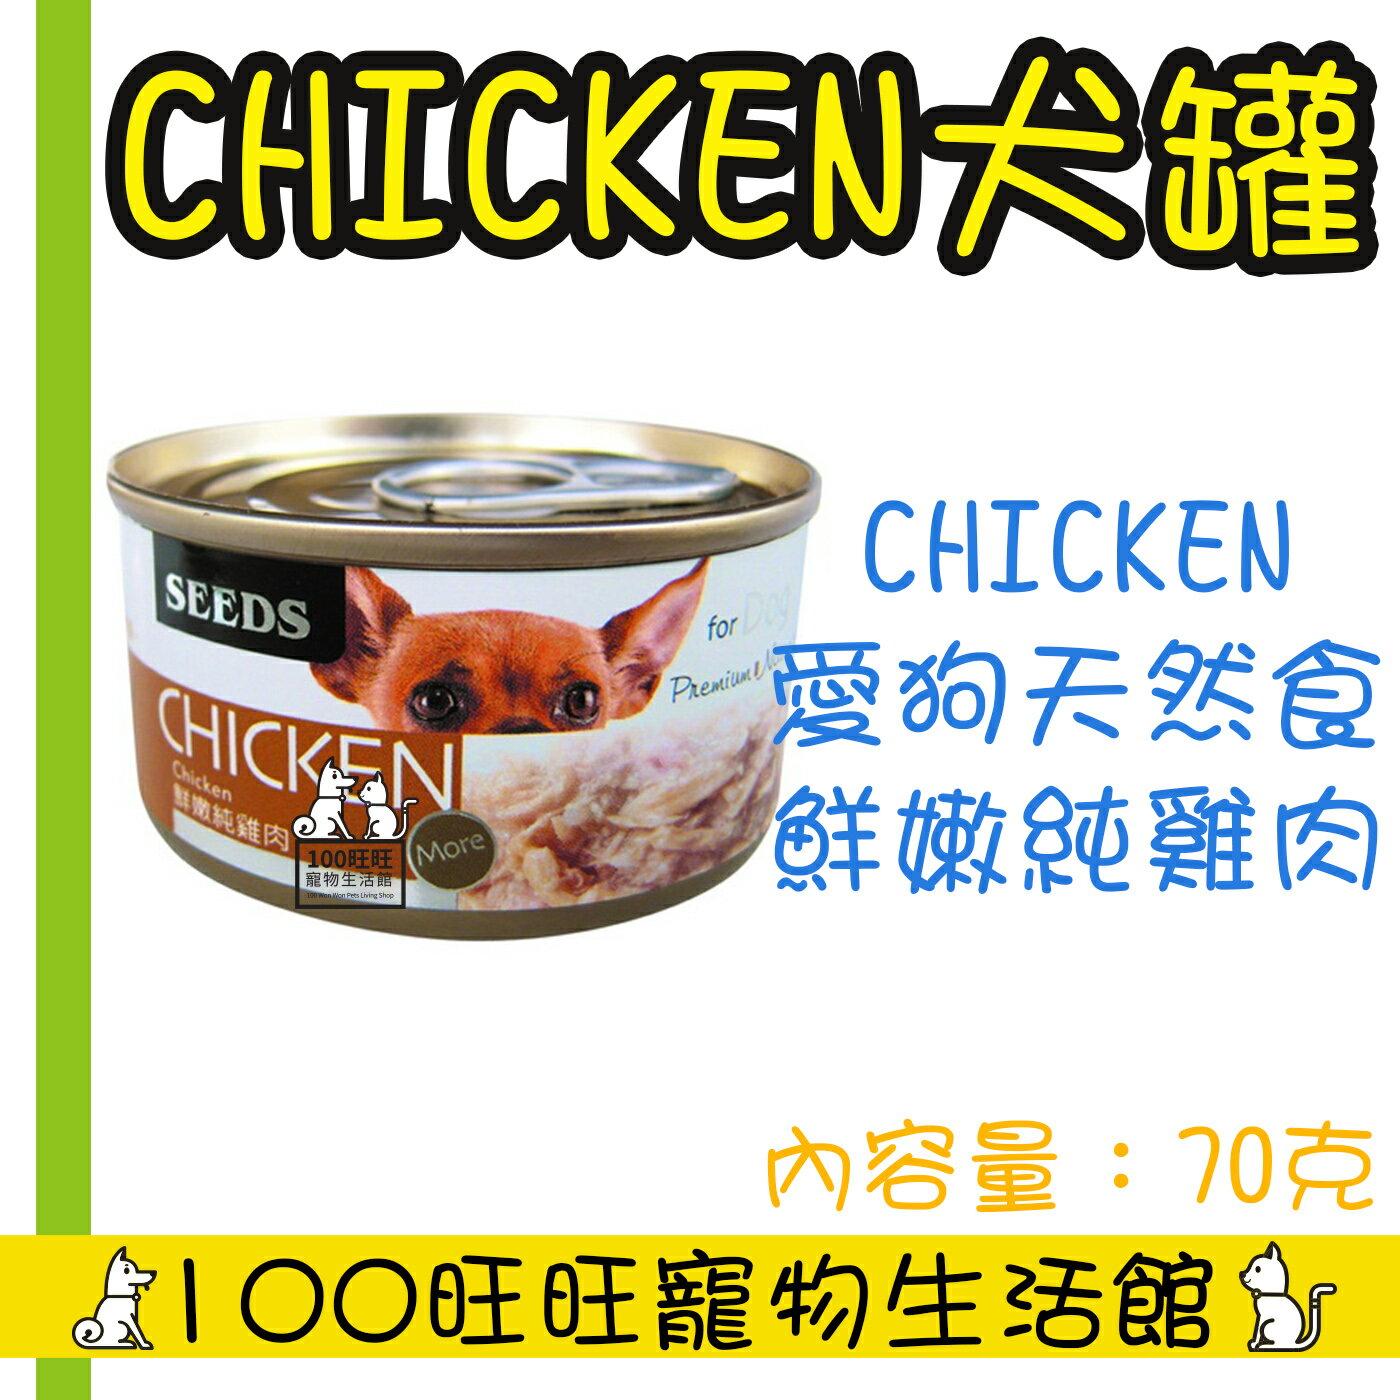 SEEDS 聖萊西 惜時 CHICKEN愛狗天然食 70g 單罐